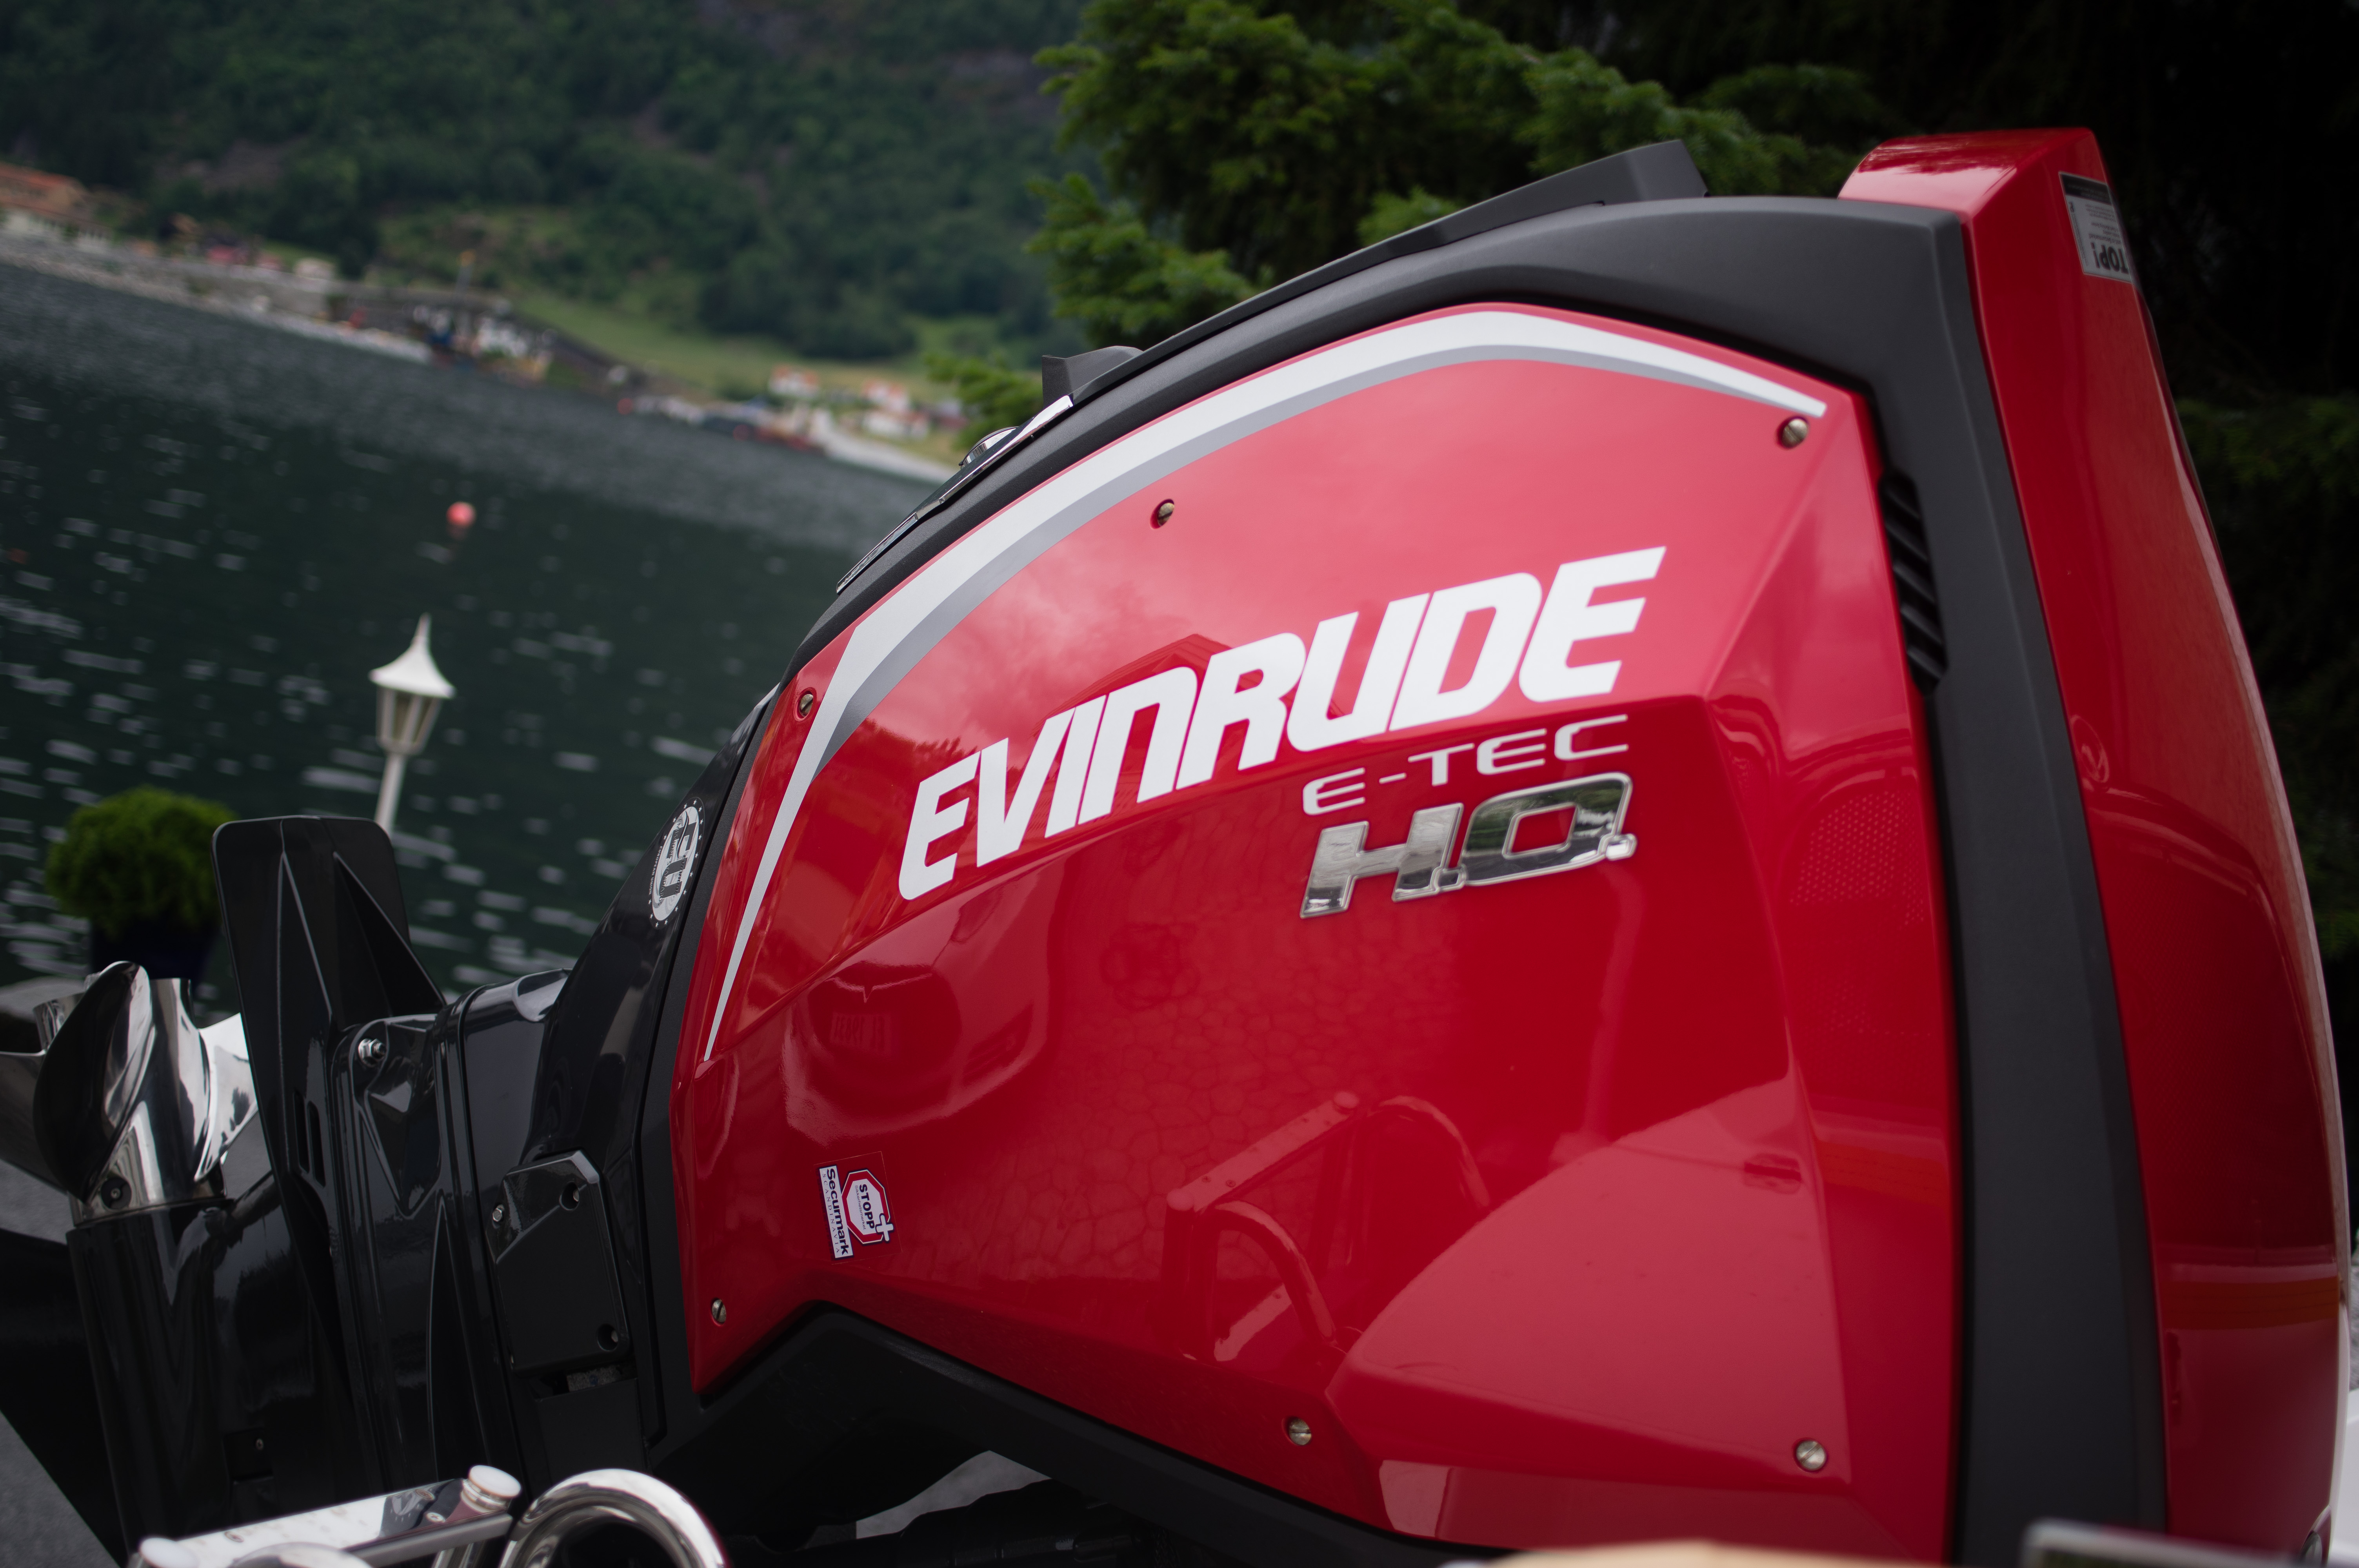 Evinrude Outboard Motors – Wikipedia